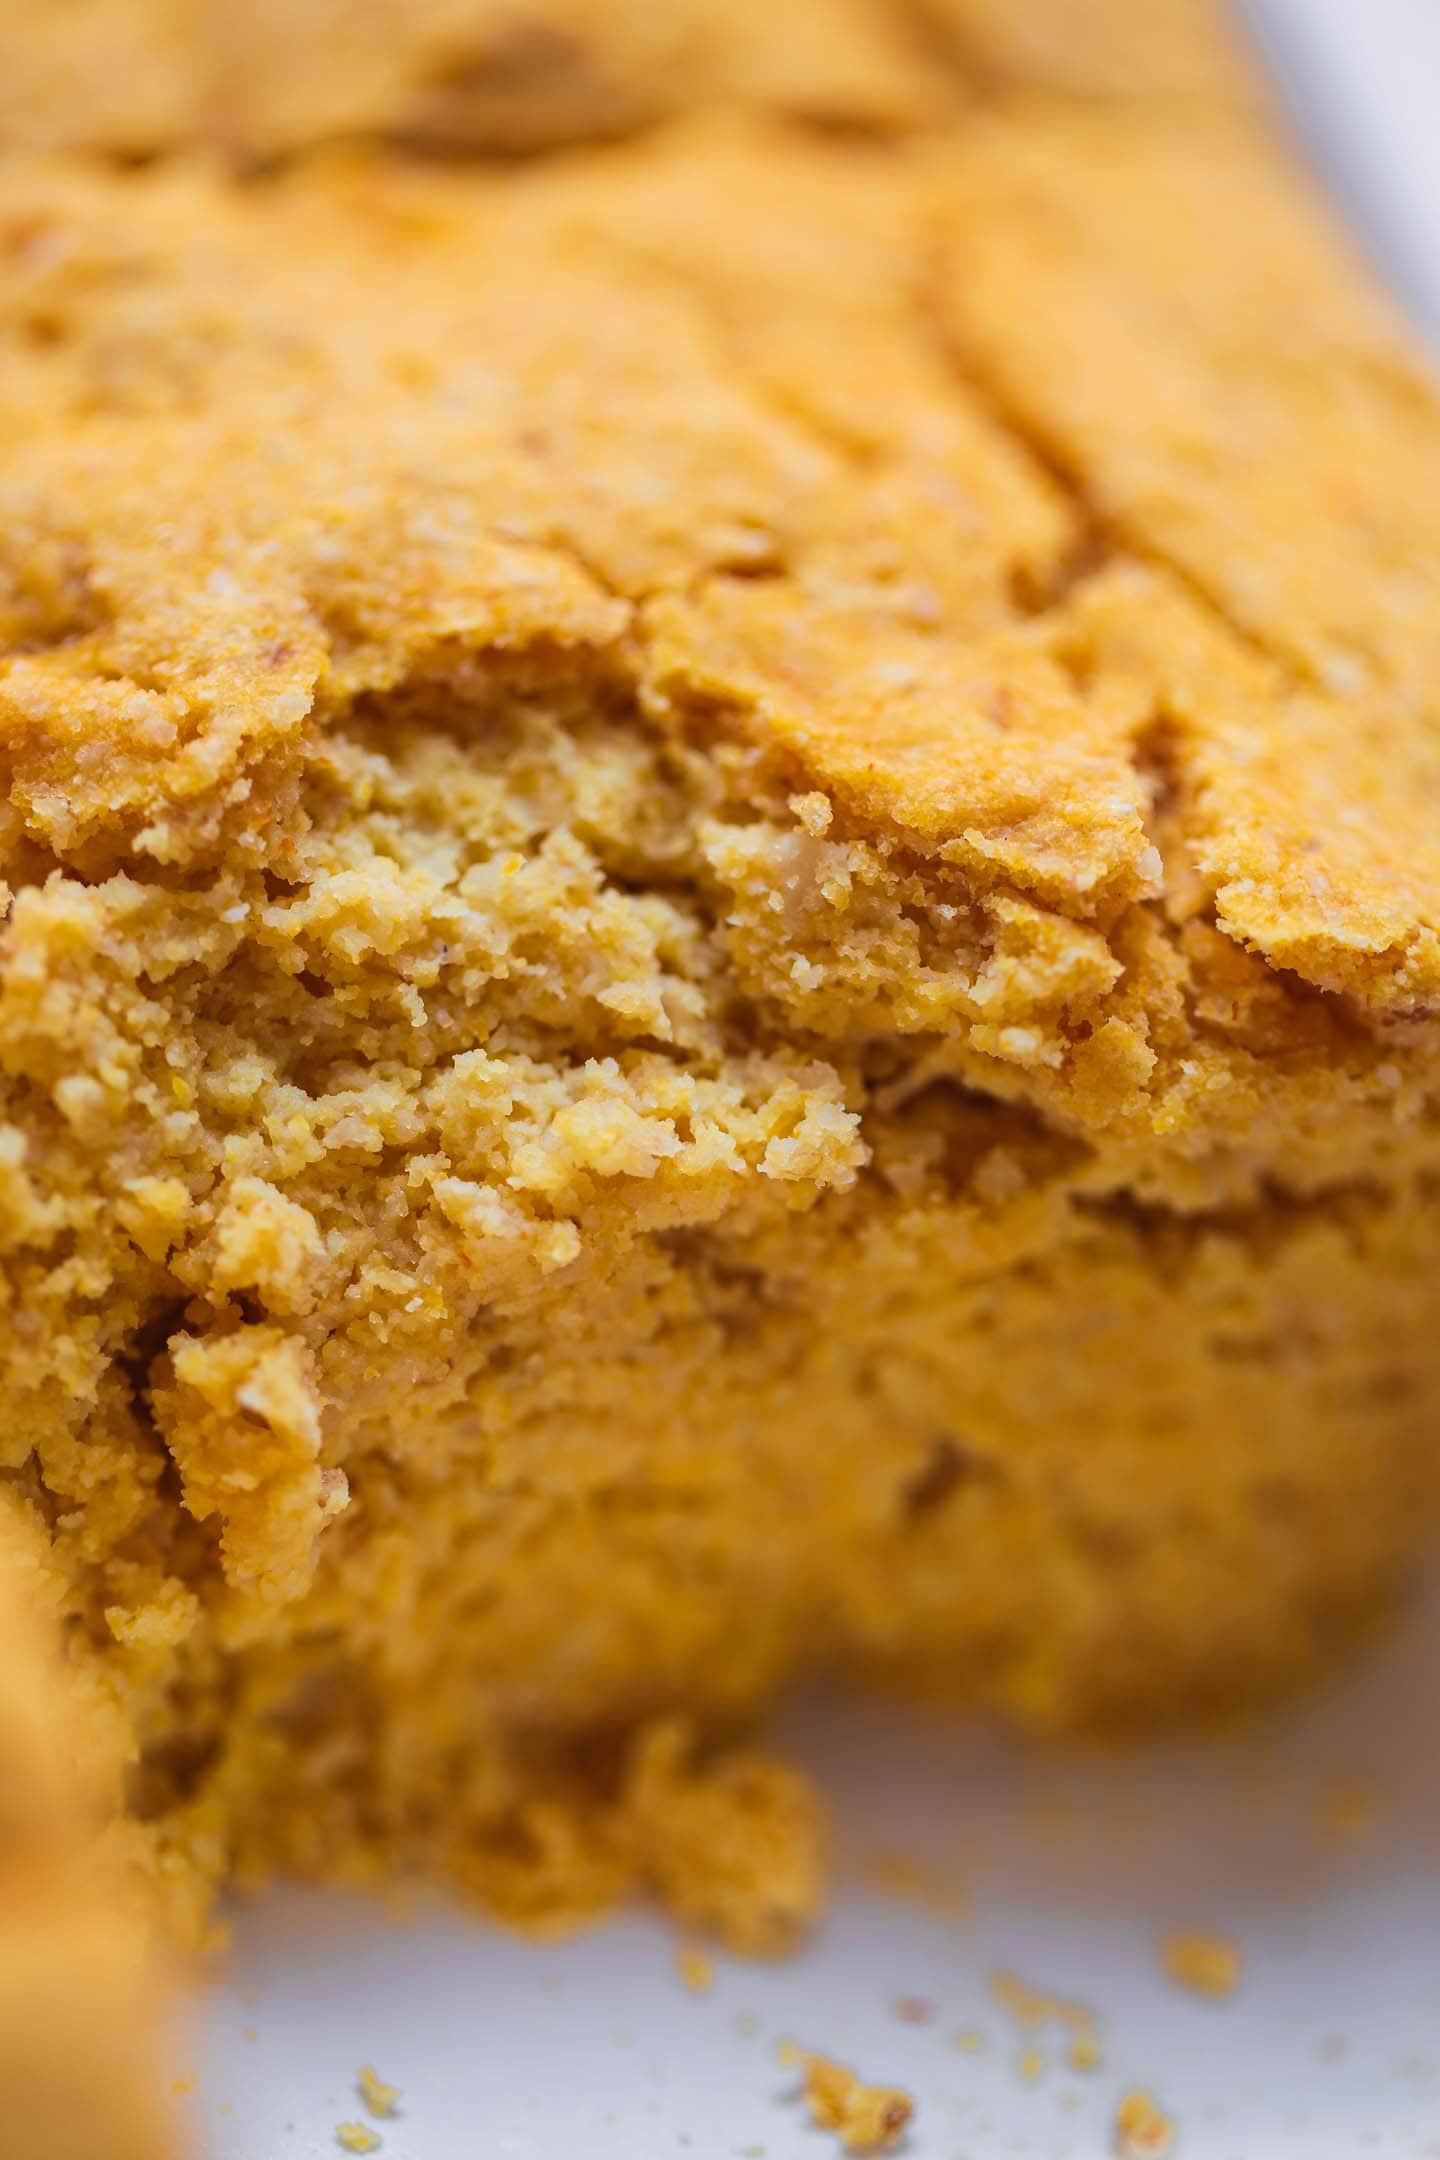 Closeup of vegan cornbread in a baking dish